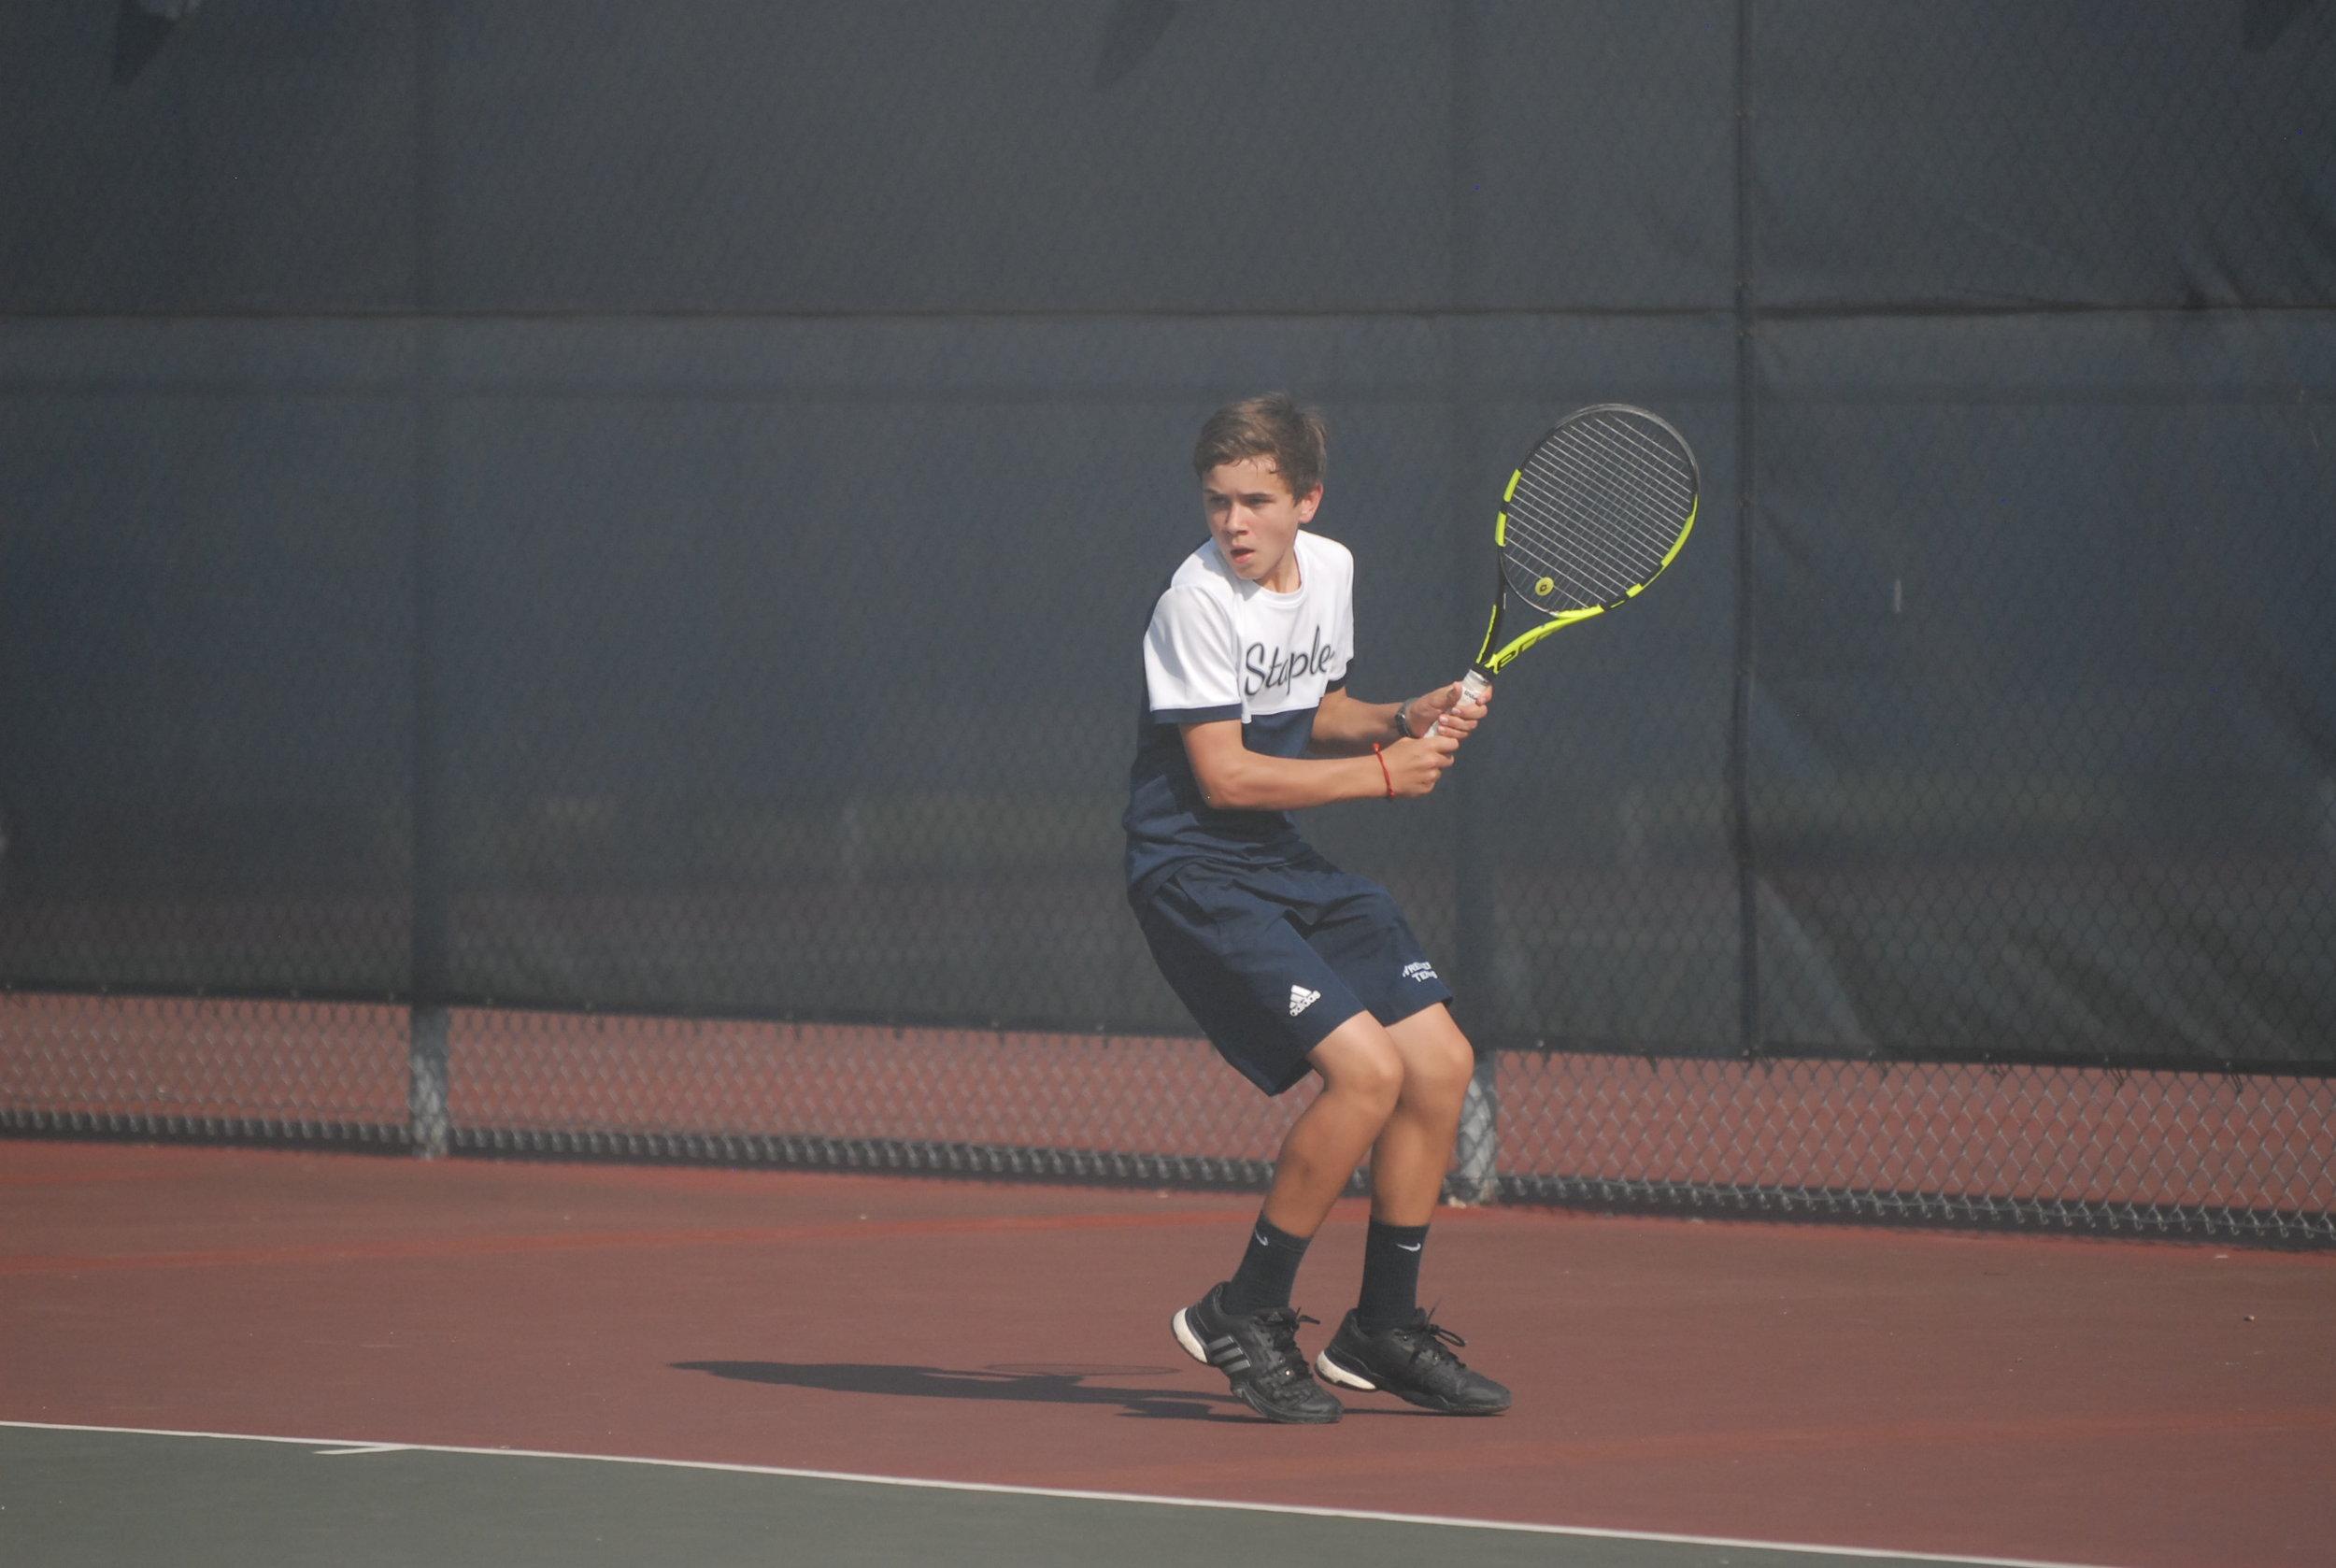 Jack Tooker   Tennis